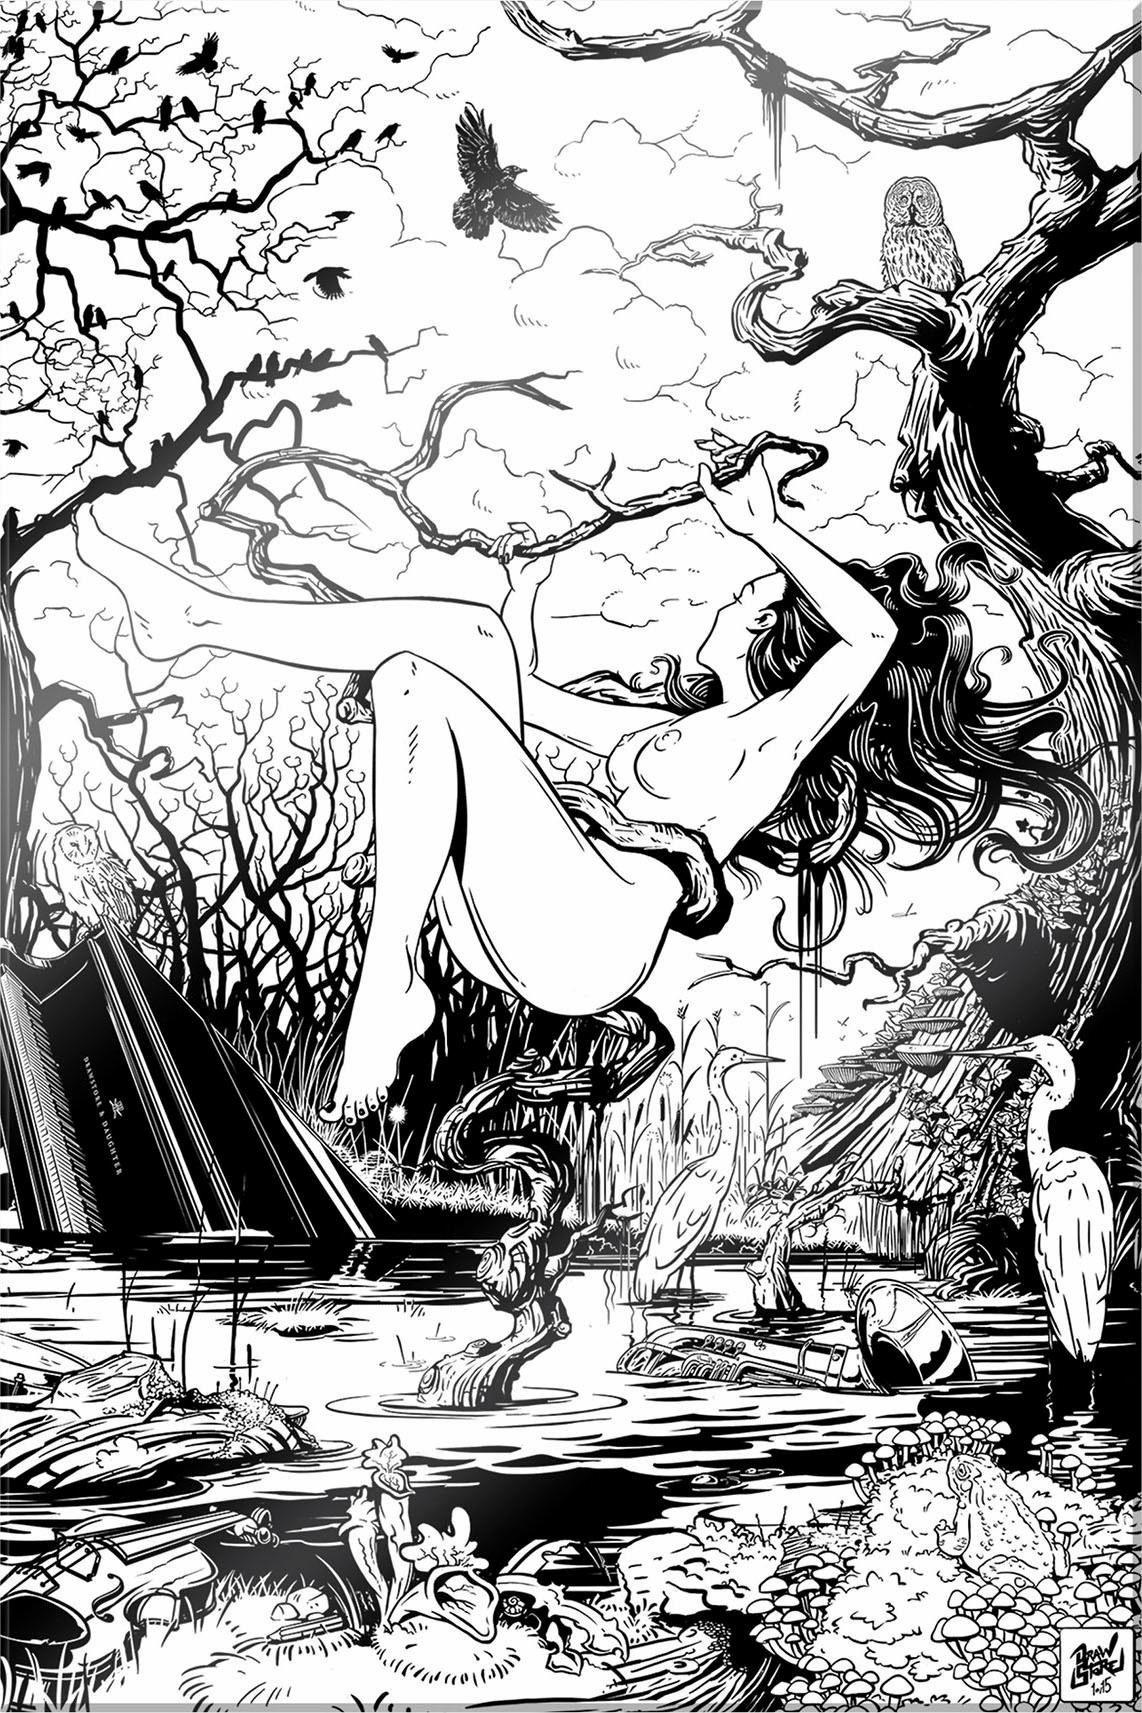 Acrylglasbild »Drawstore - Swampland«, Frau, Baum, 40/60 cm